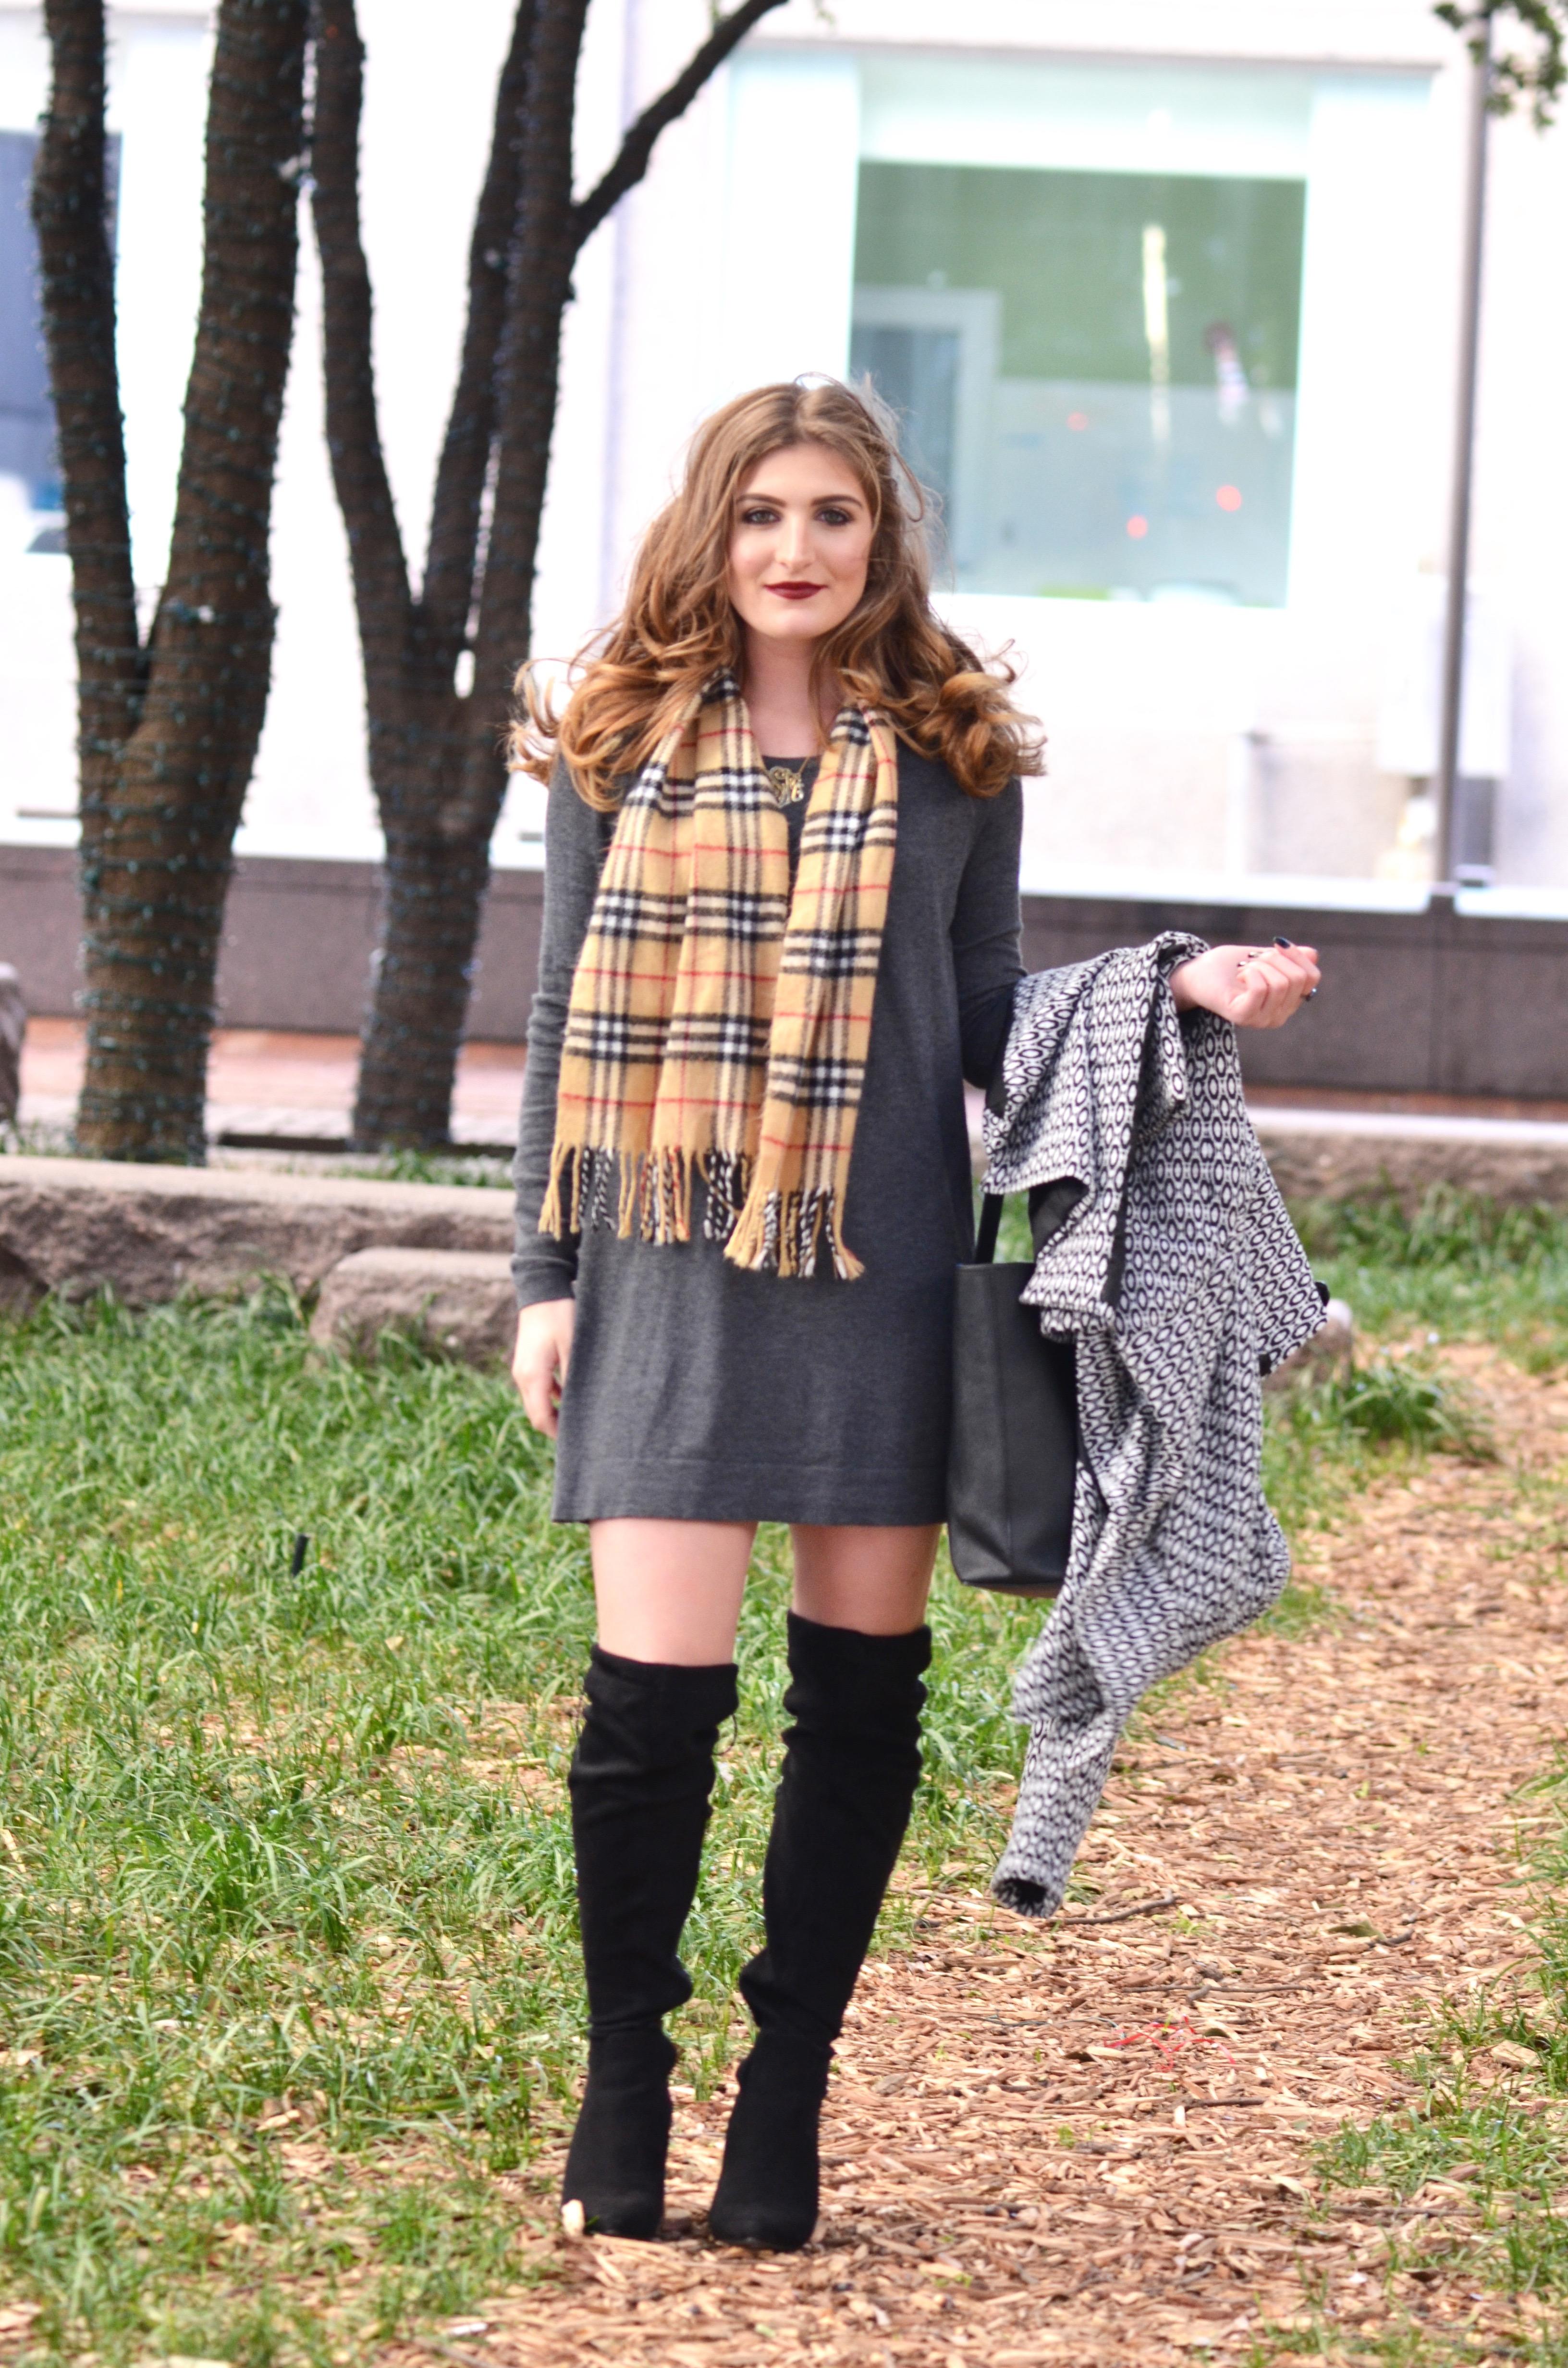 fashion on a windy day